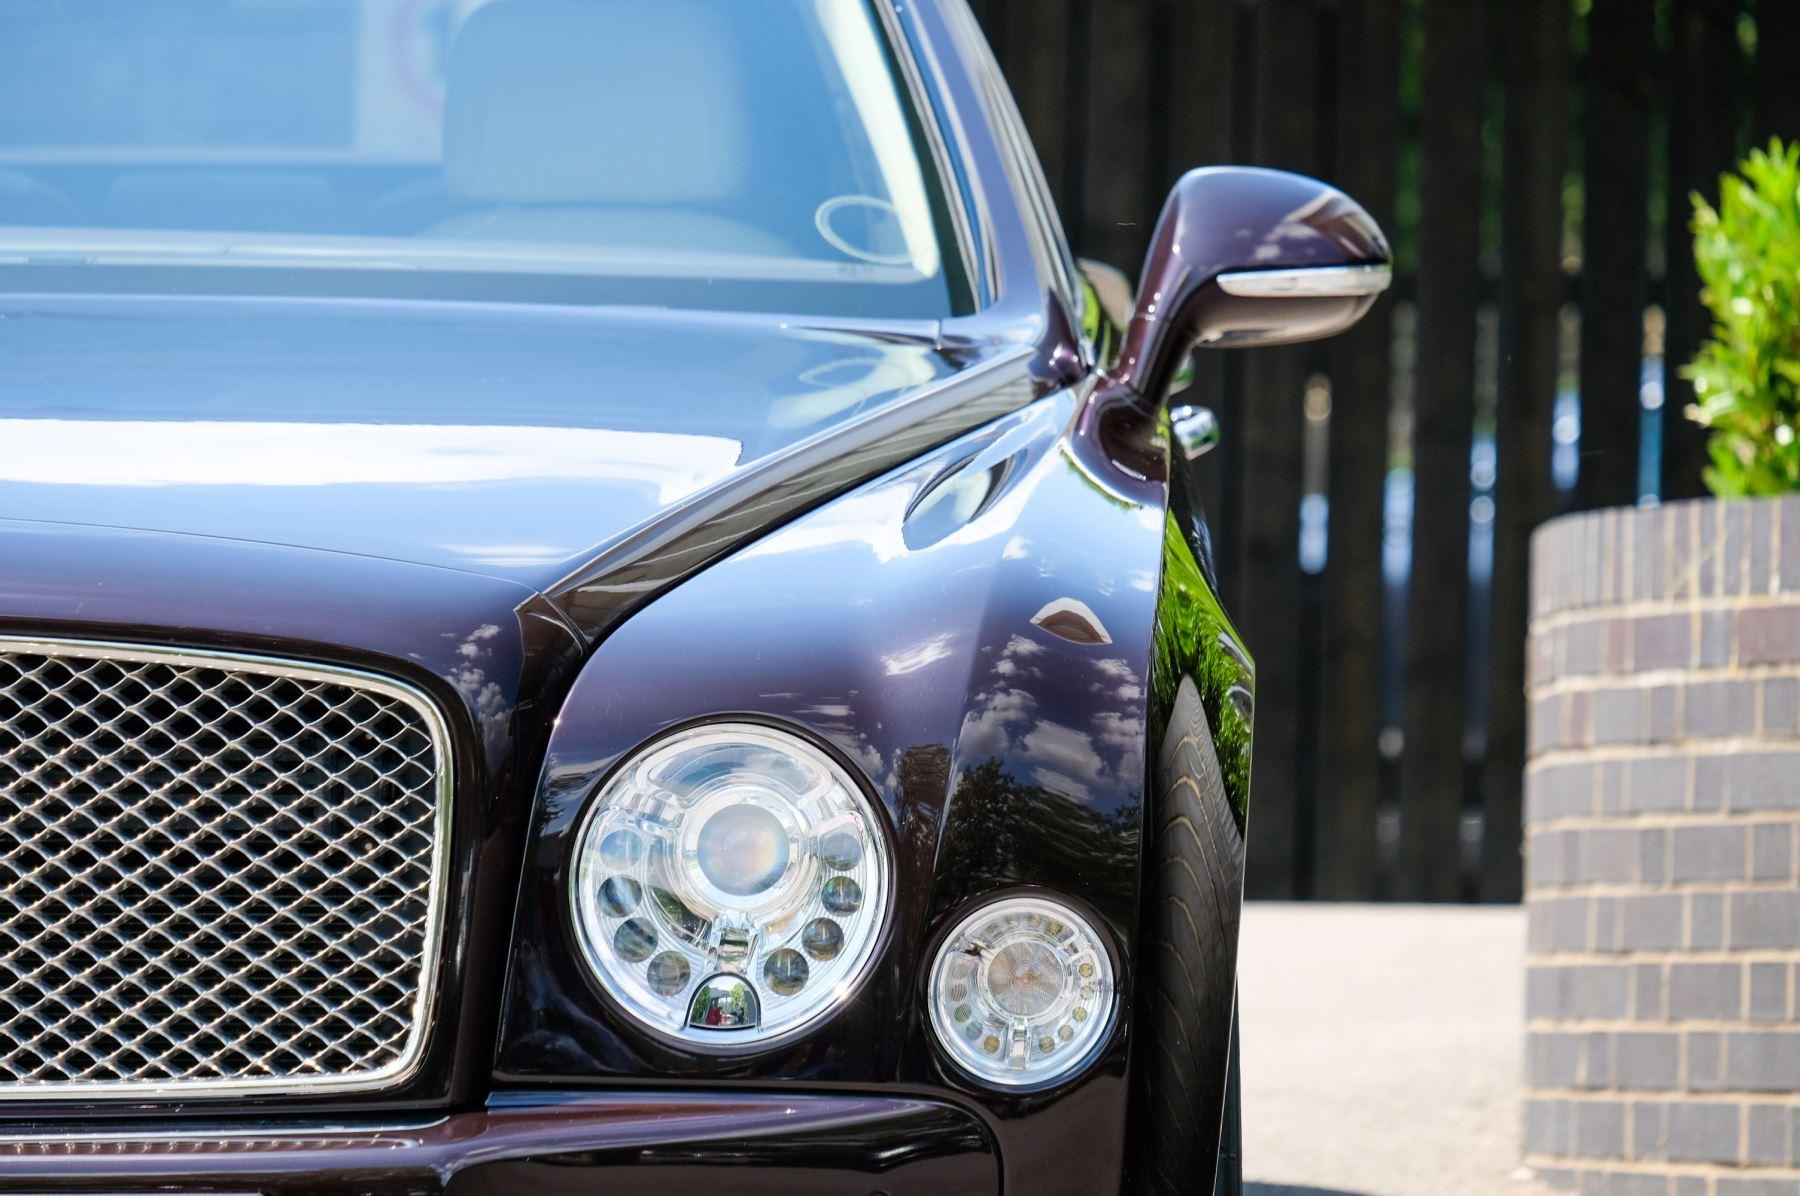 Bentley Mulsanne 6.8 V8 - Comfort, Entertainment and Premier Specification image 6